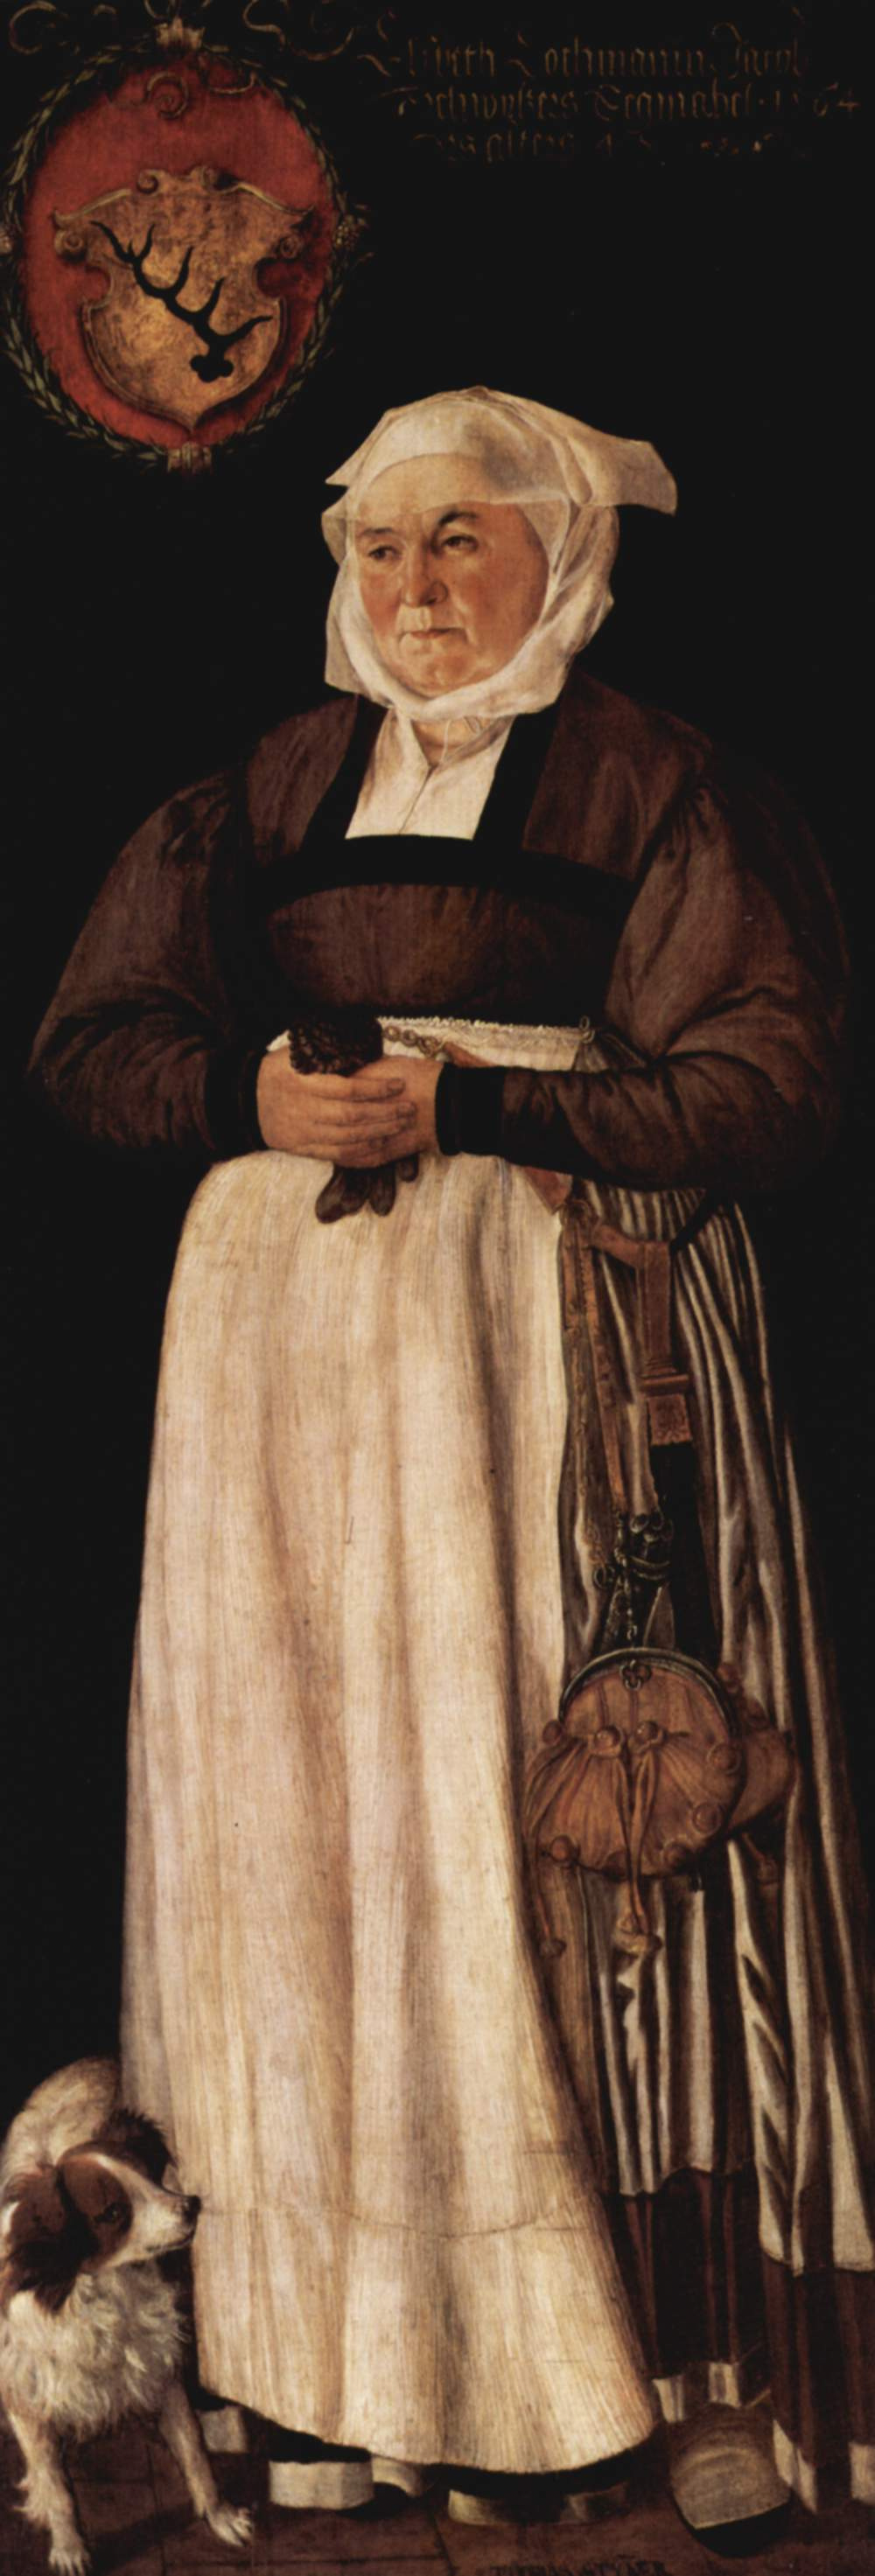 Tobias Stimmer. Portrait of Elsbeth Lohman, wife of the Zurich official Jacob Switzer